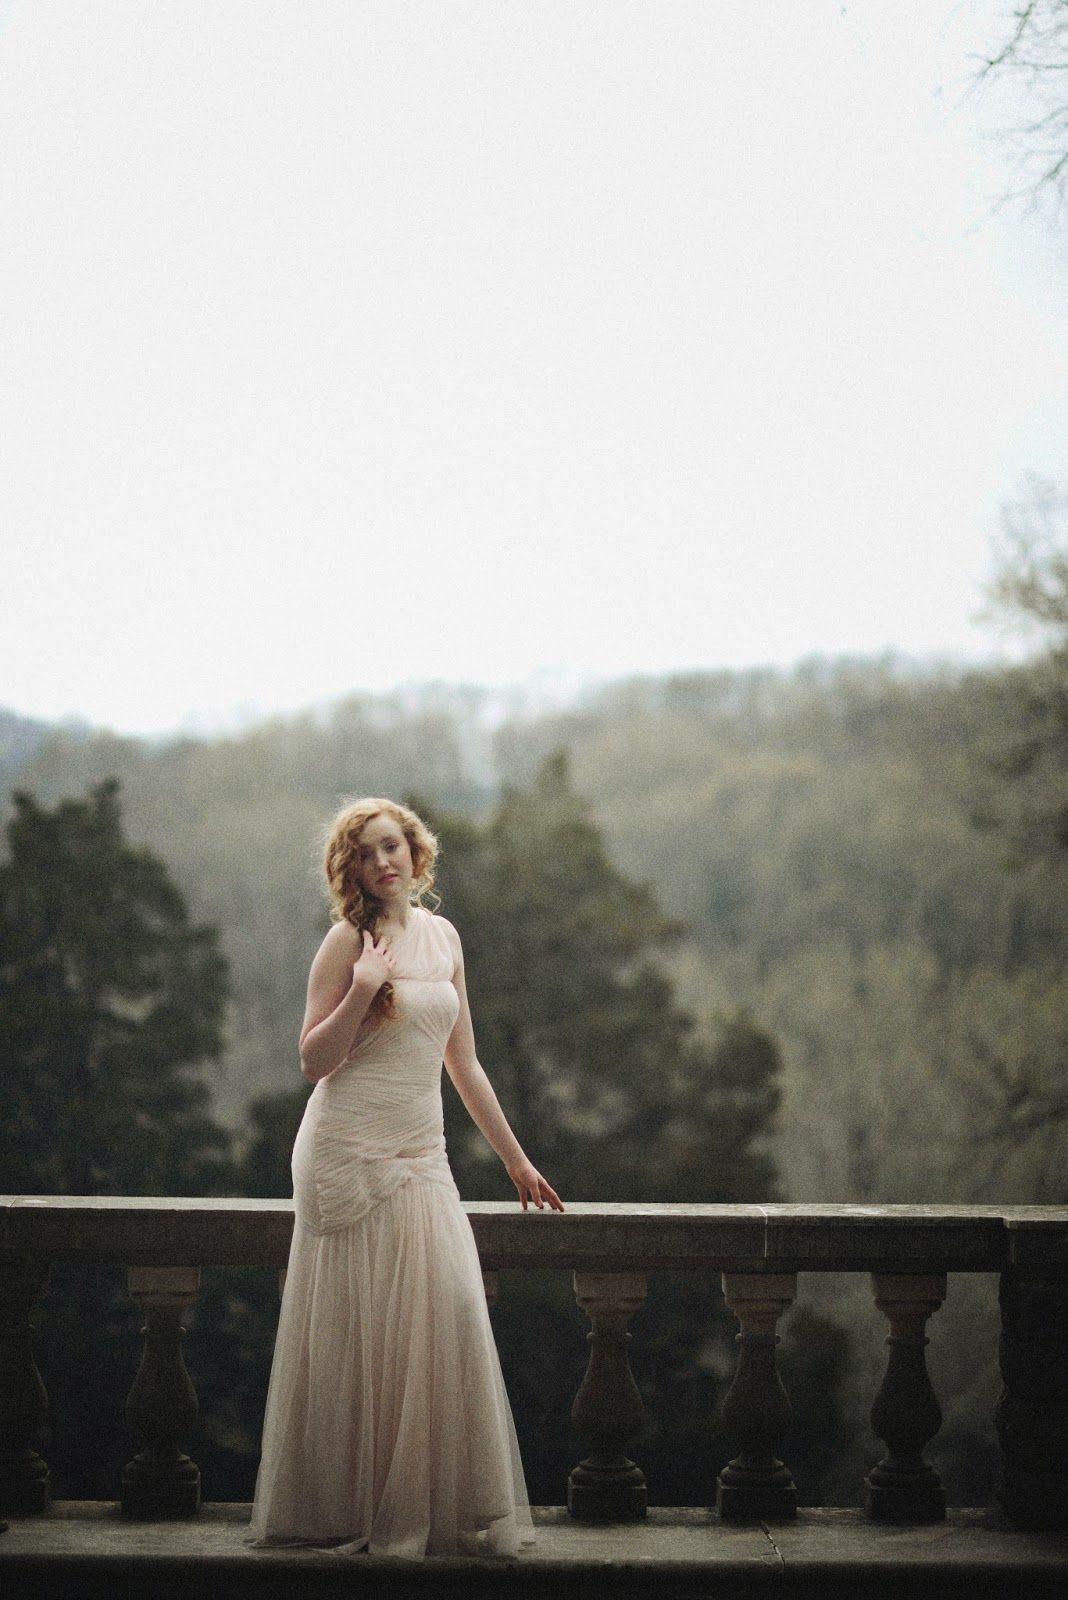 Secret Garden Editorial | Nashville Editorial Photographer | Monique Lhuillier Gown